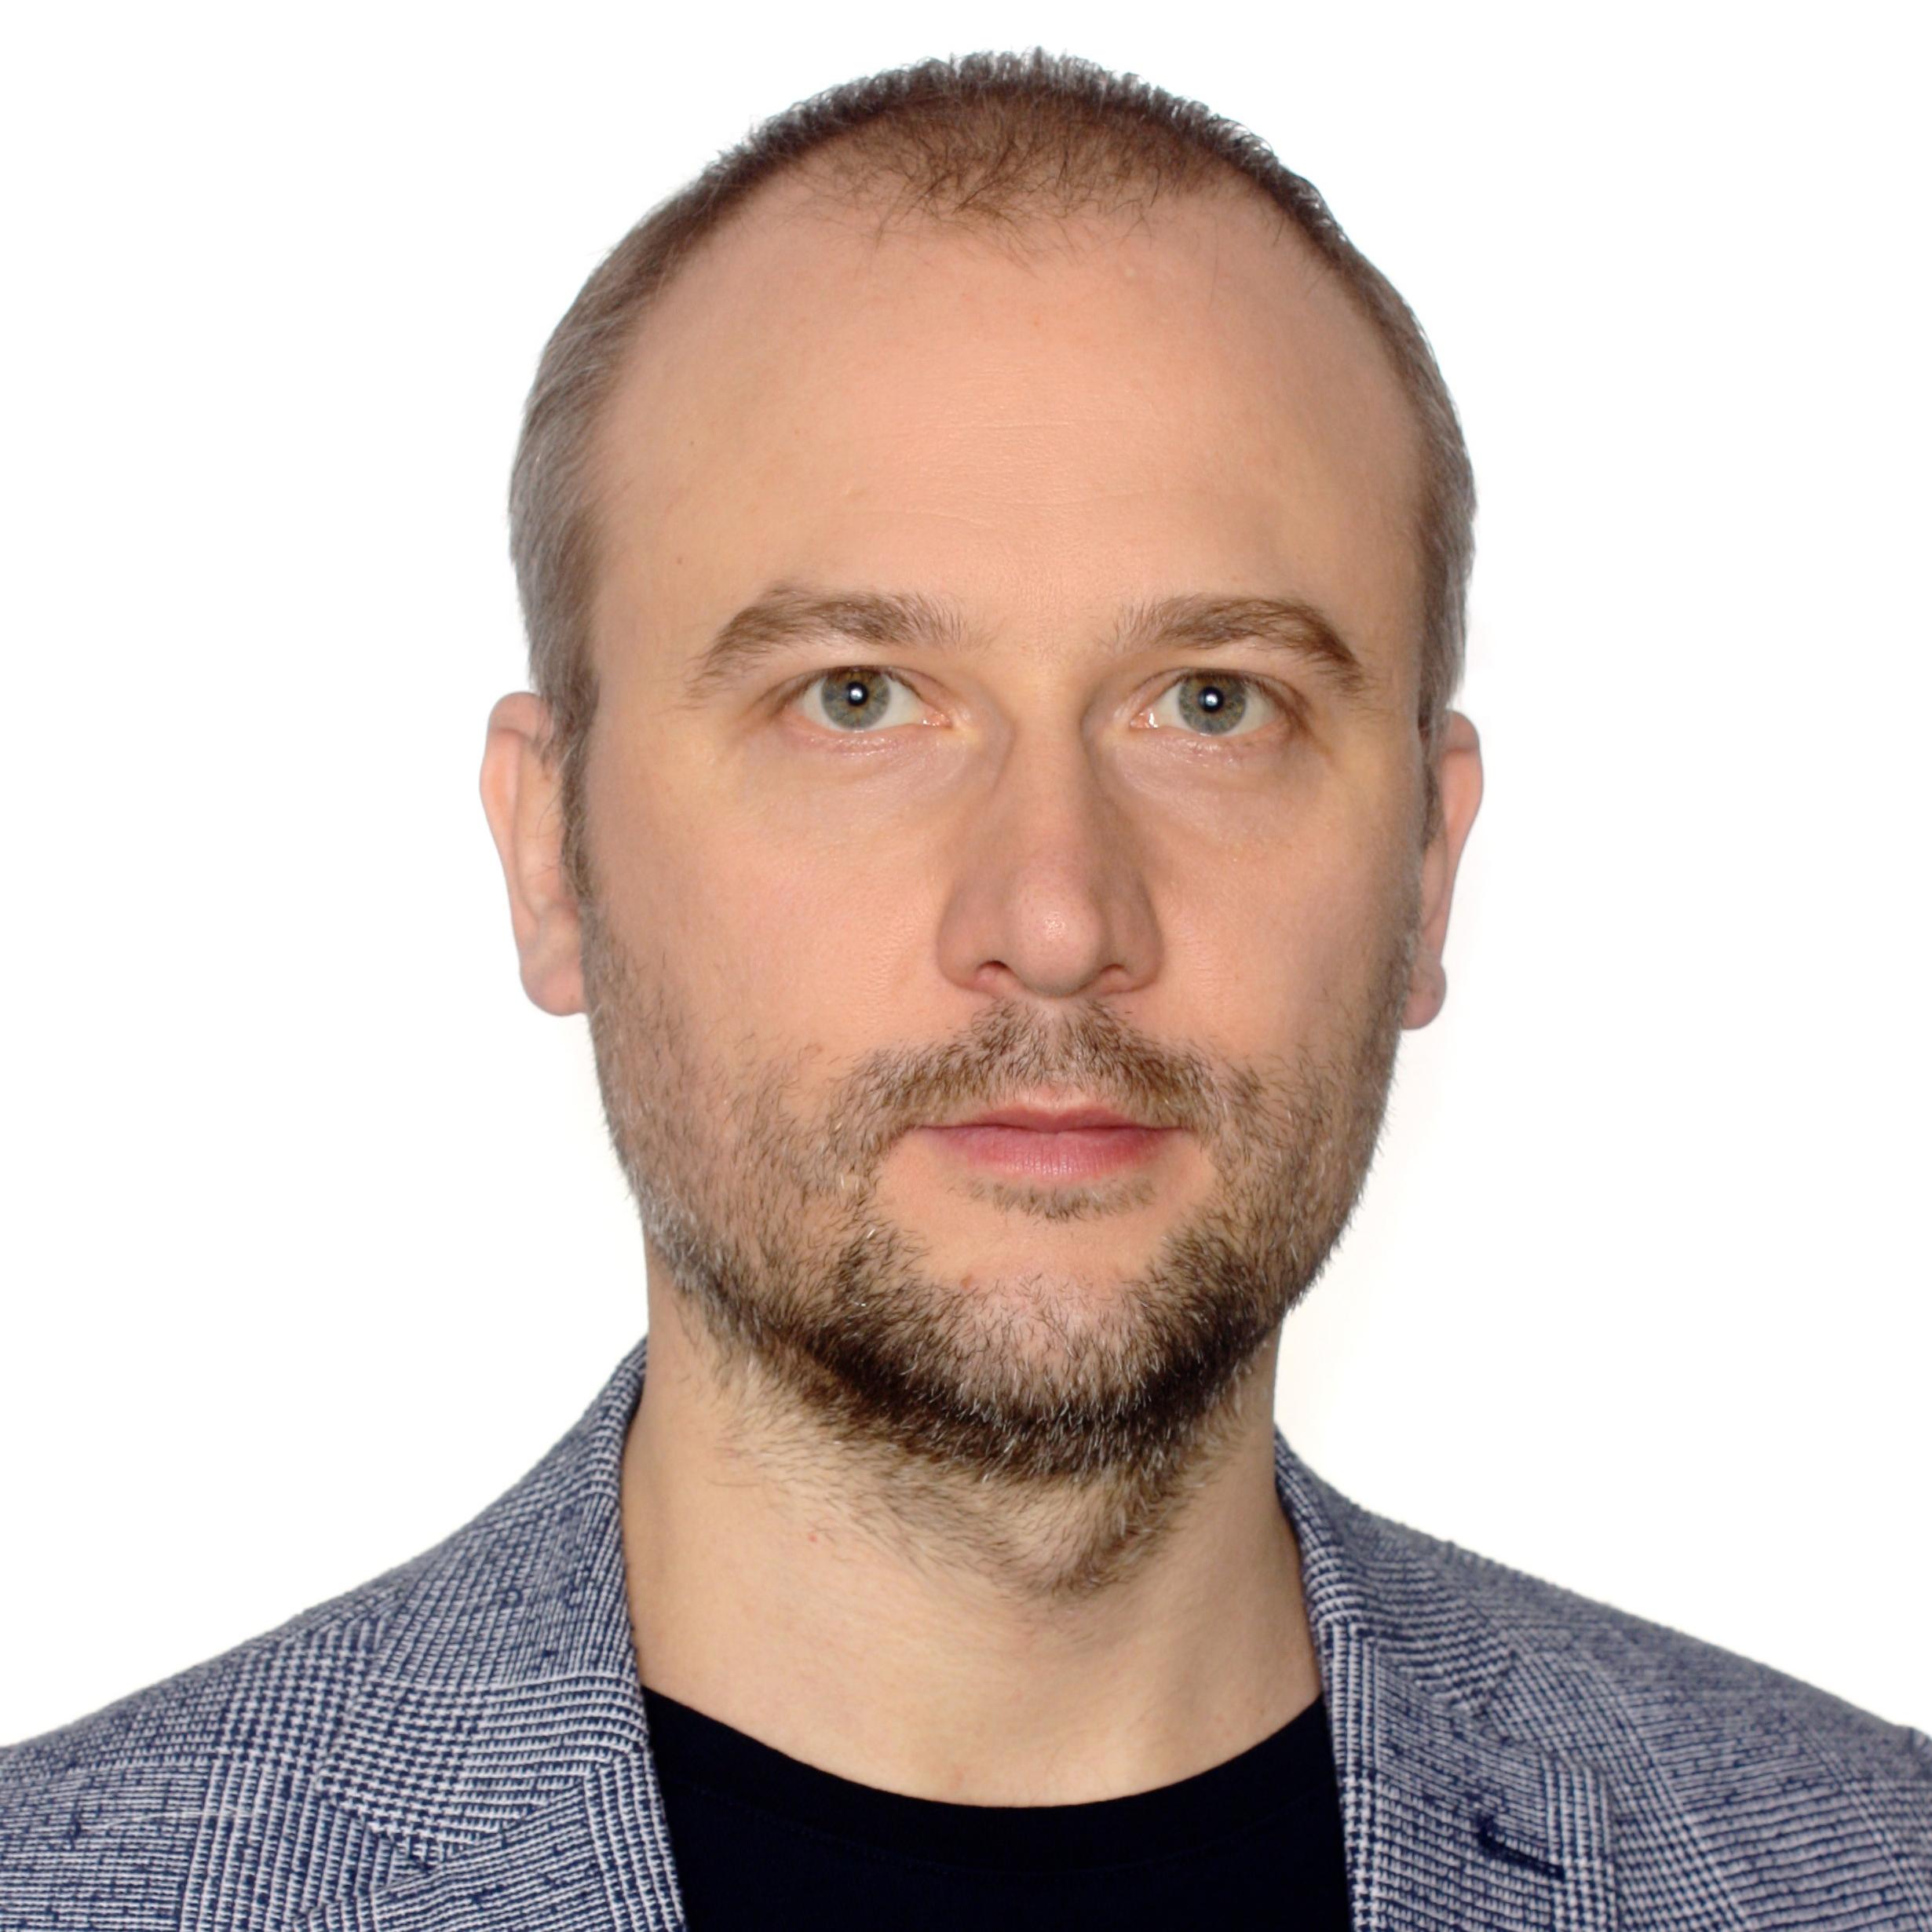 Плюшкин Денис Спортмастер